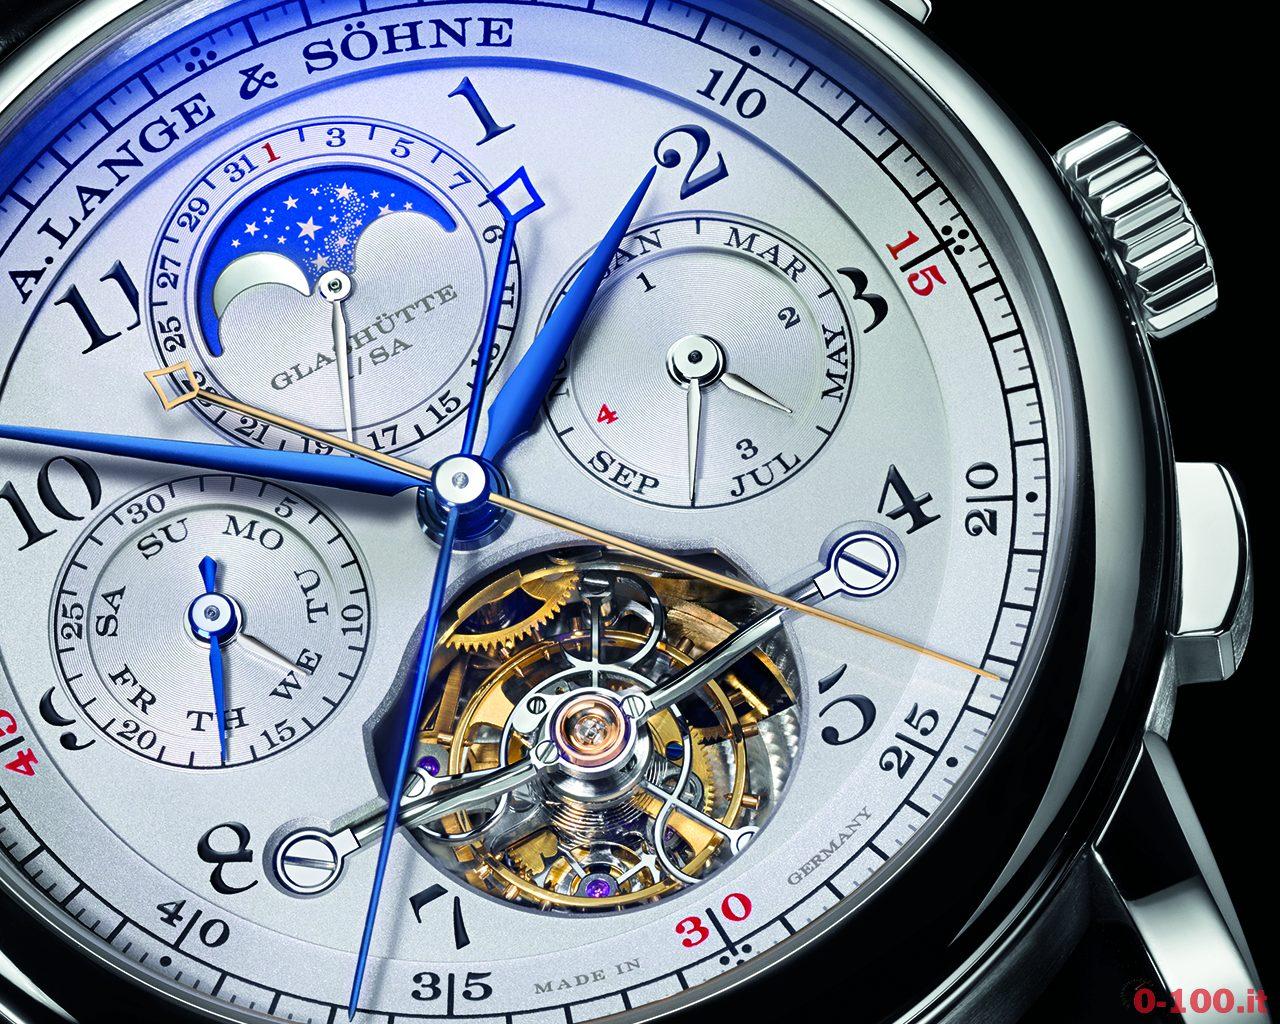 a-lange-sohne-tourbograph-perpetual-pour-le-merite-limited-edition-ref-706-025-prezzo-price-sihh-2017_0-1007